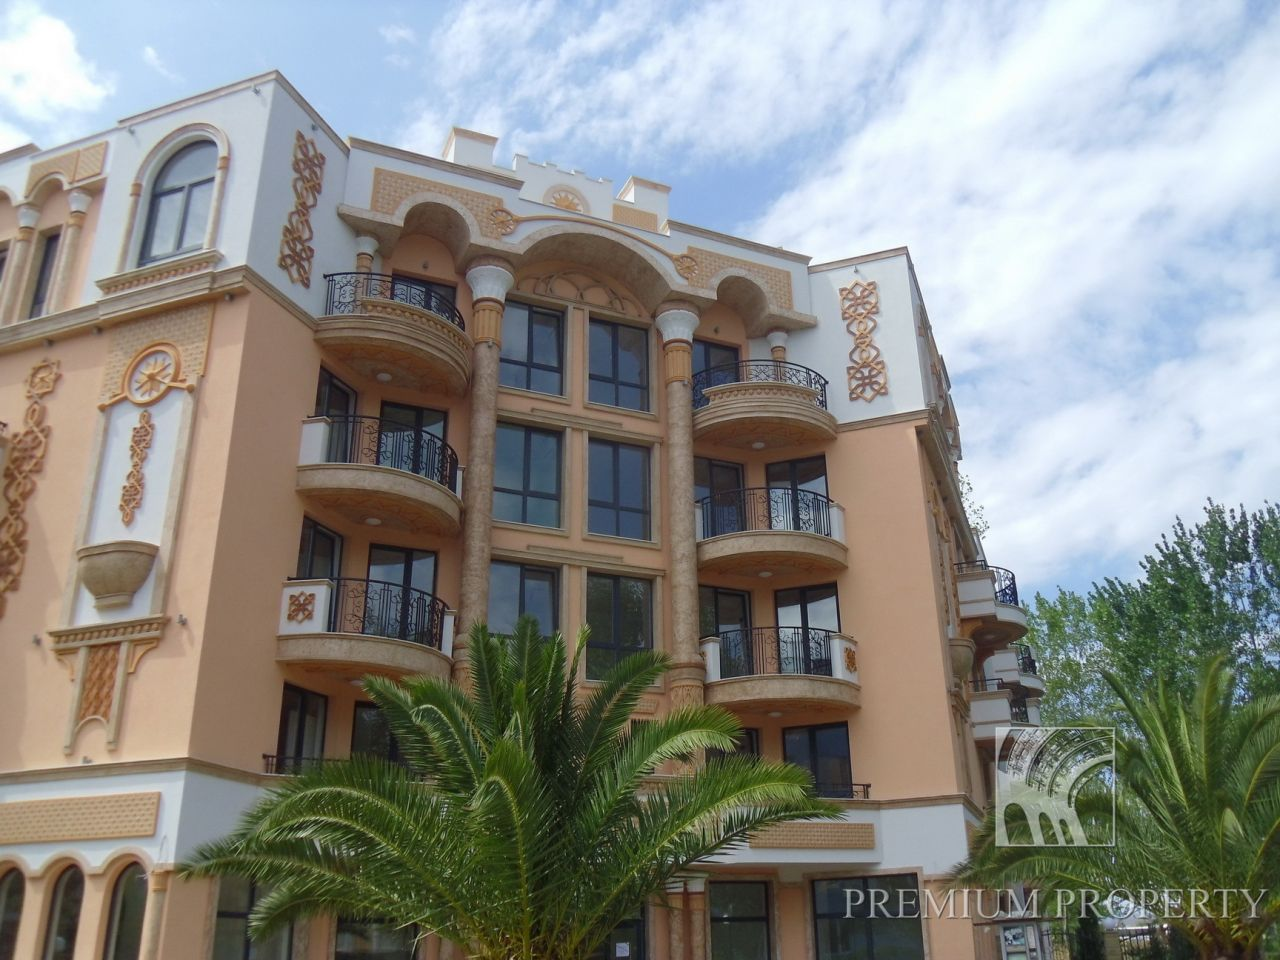 Апартаменты на Солнечном берегу, Болгария, 52.98 м2 - фото 1